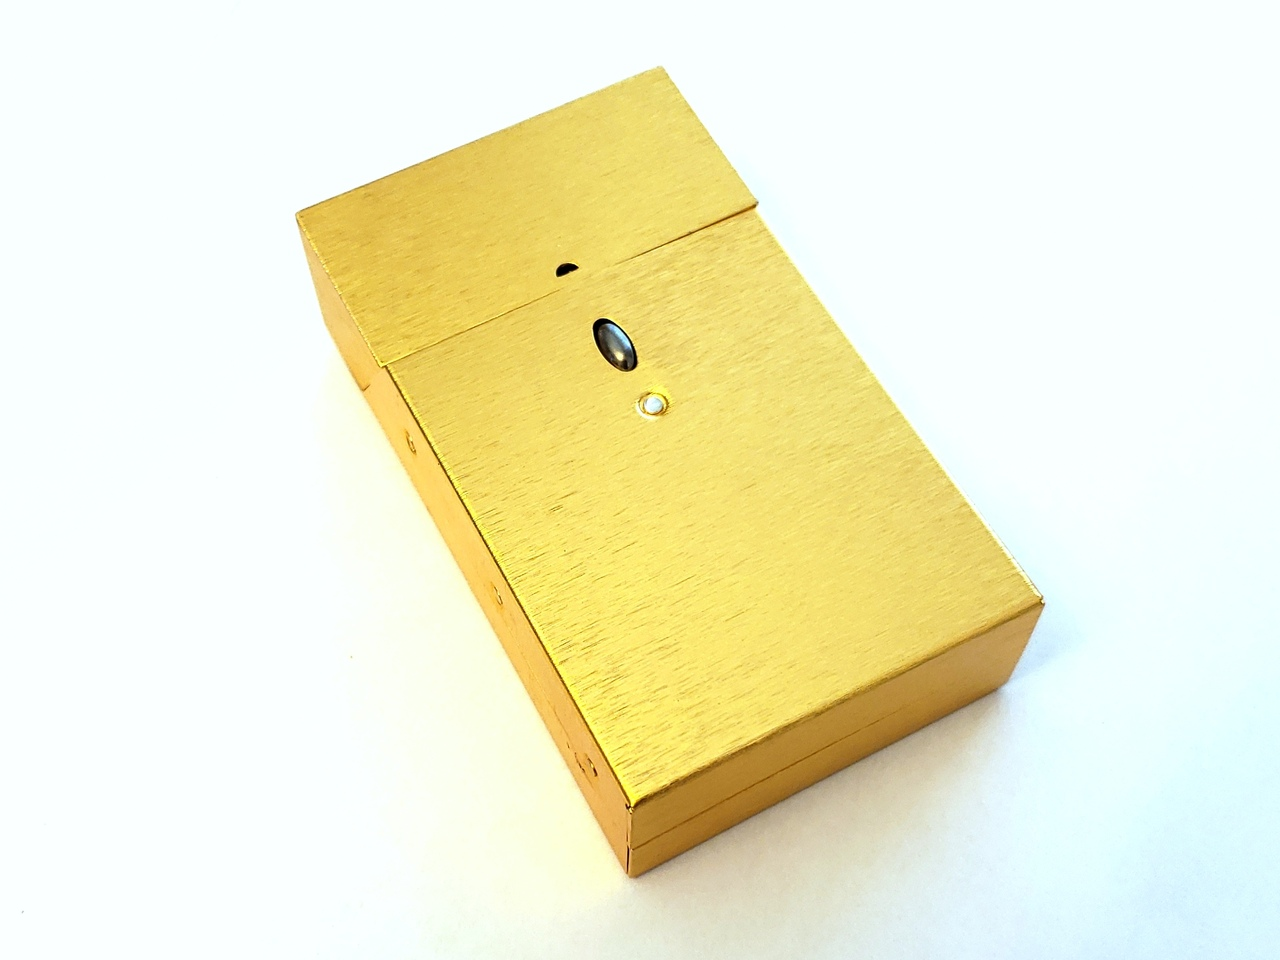 Satin Gold Cigarette Pack Holder